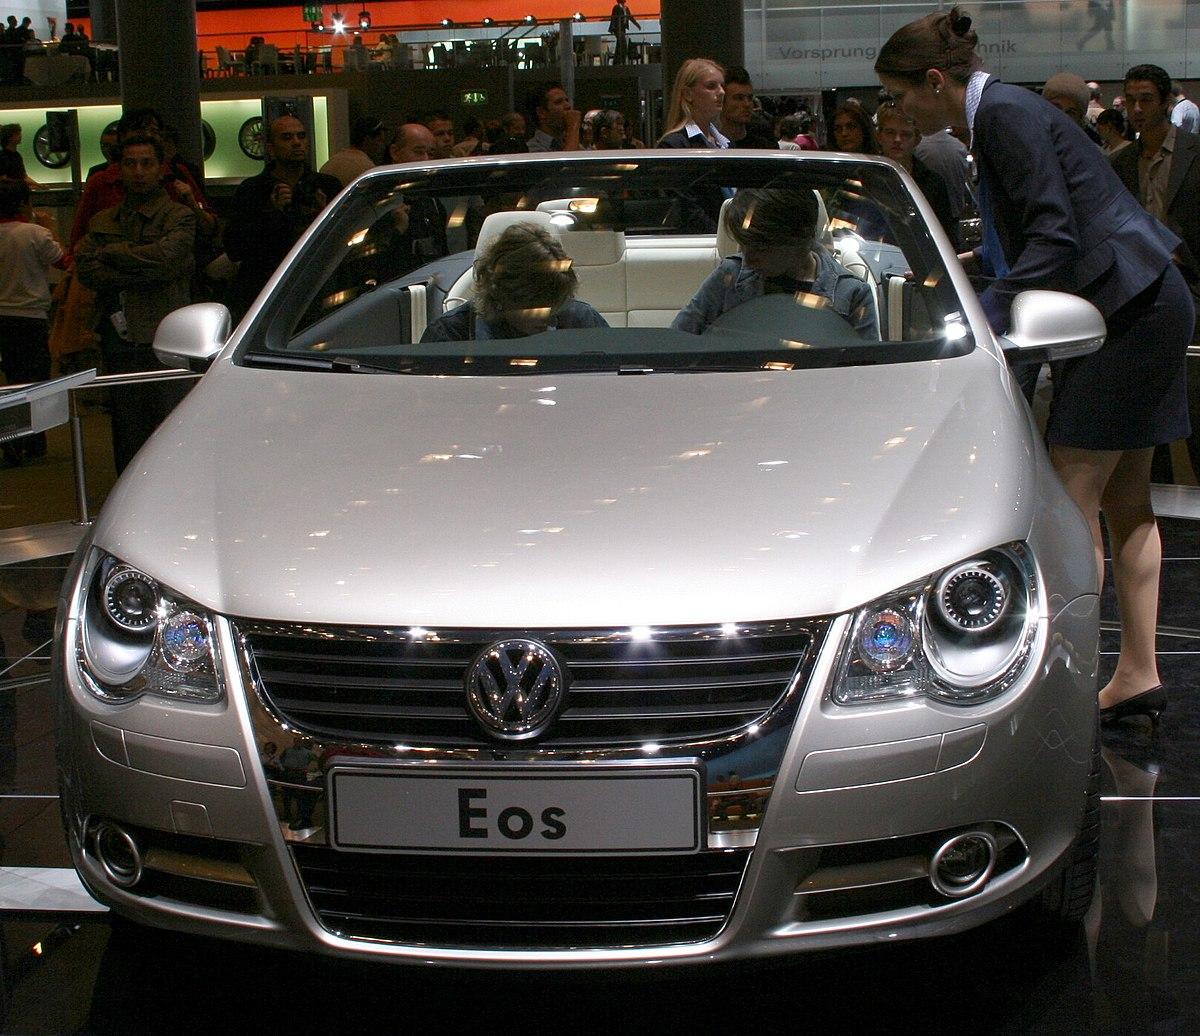 Volkswagen Eos - Wikipedia